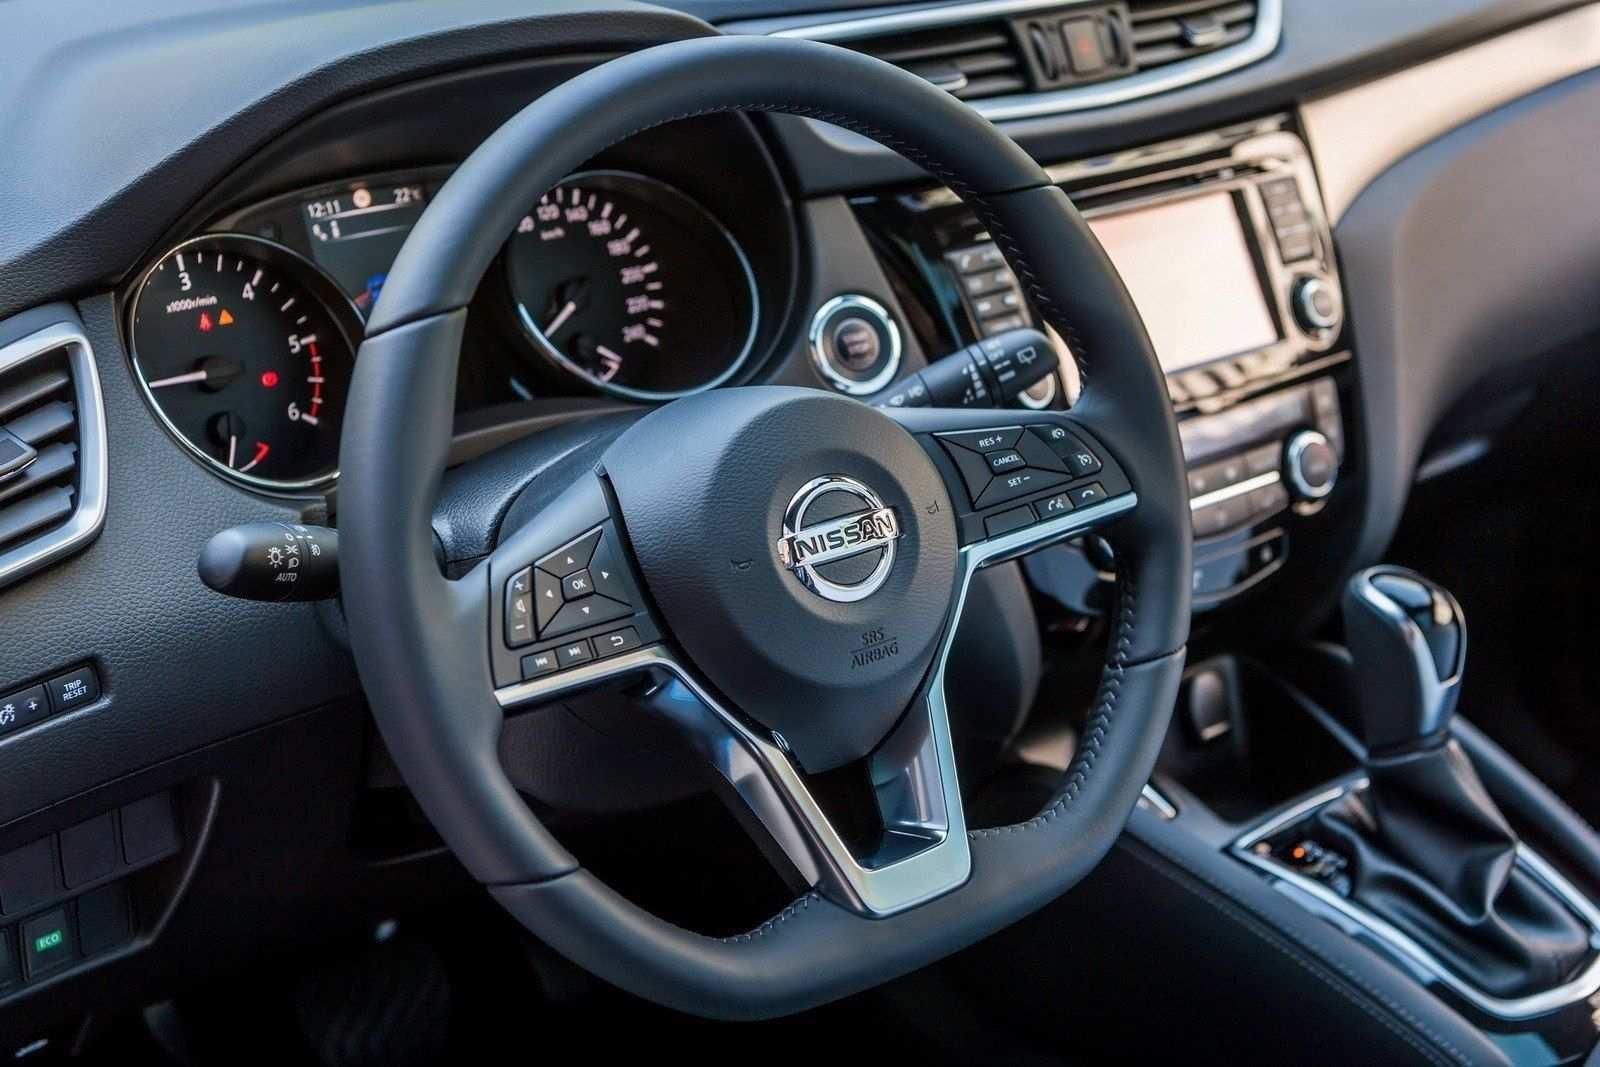 75 Great Nissan Qashqai 2020 Interior History by Nissan Qashqai 2020 Interior